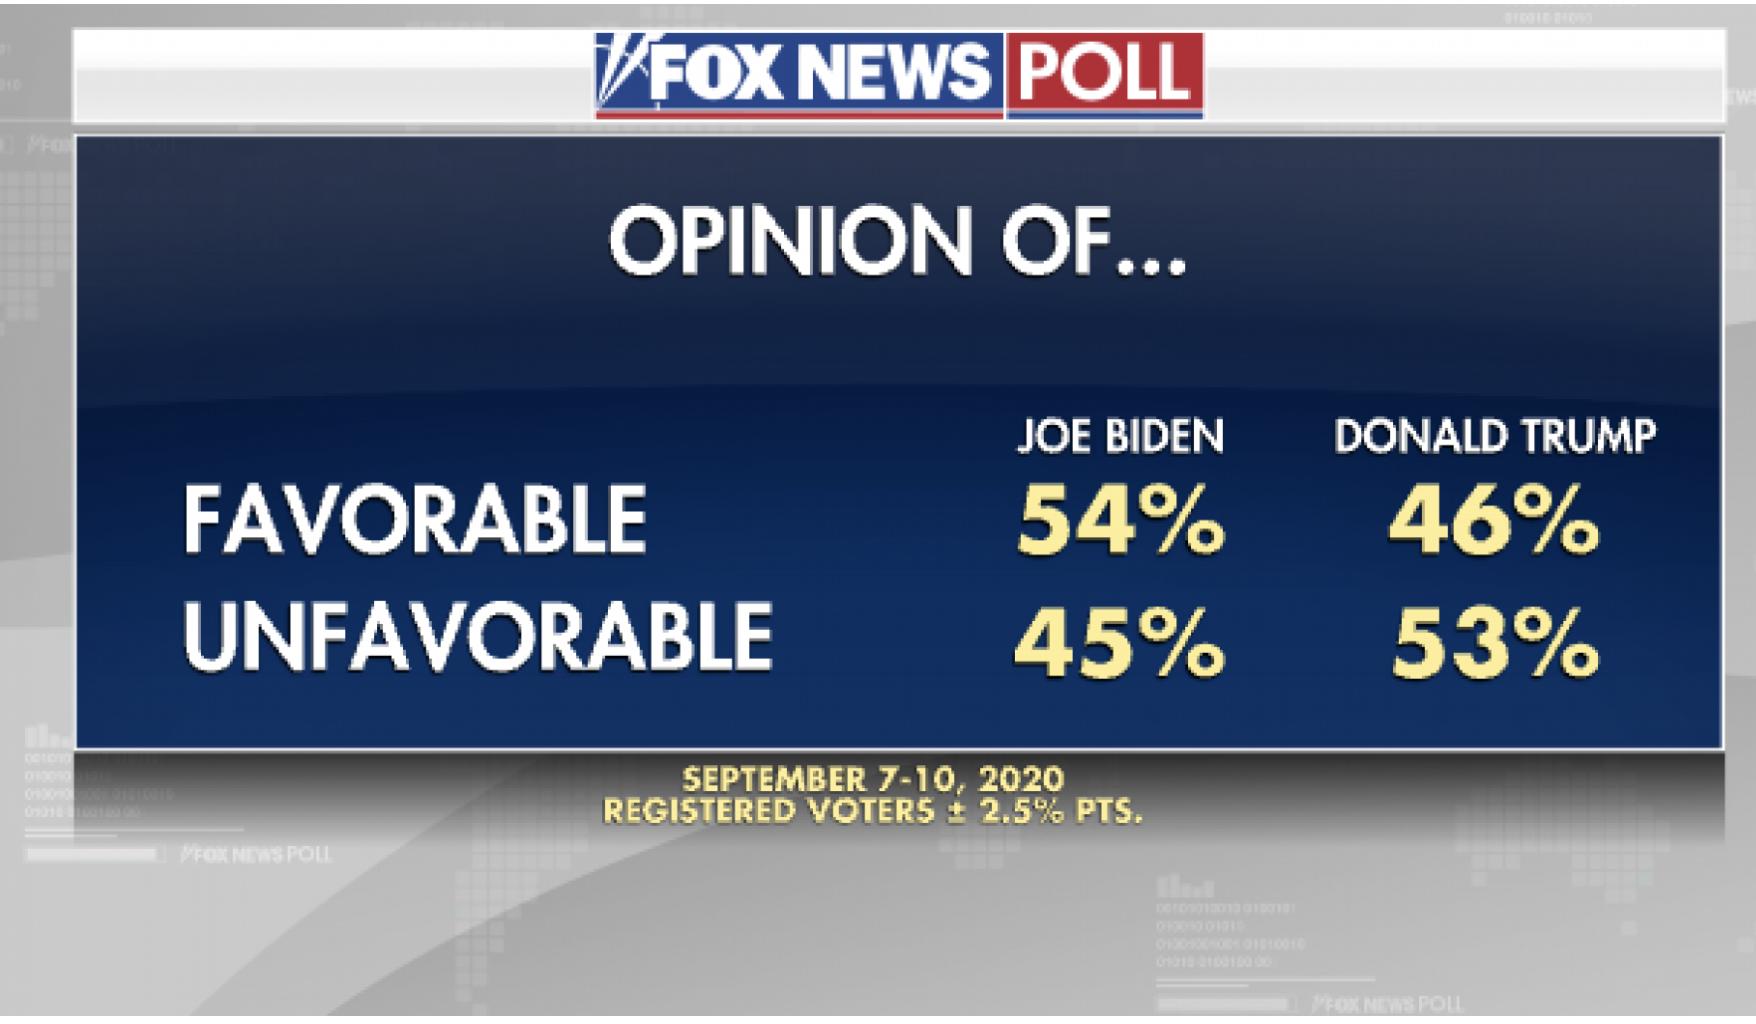 Screen-Shot-2020-09-13-at-12.57.42-PM 7-Different 2020 Polls Released Show Decisive Joe Biden Sweep Election 2020 Featured Politics Polls Top Stories